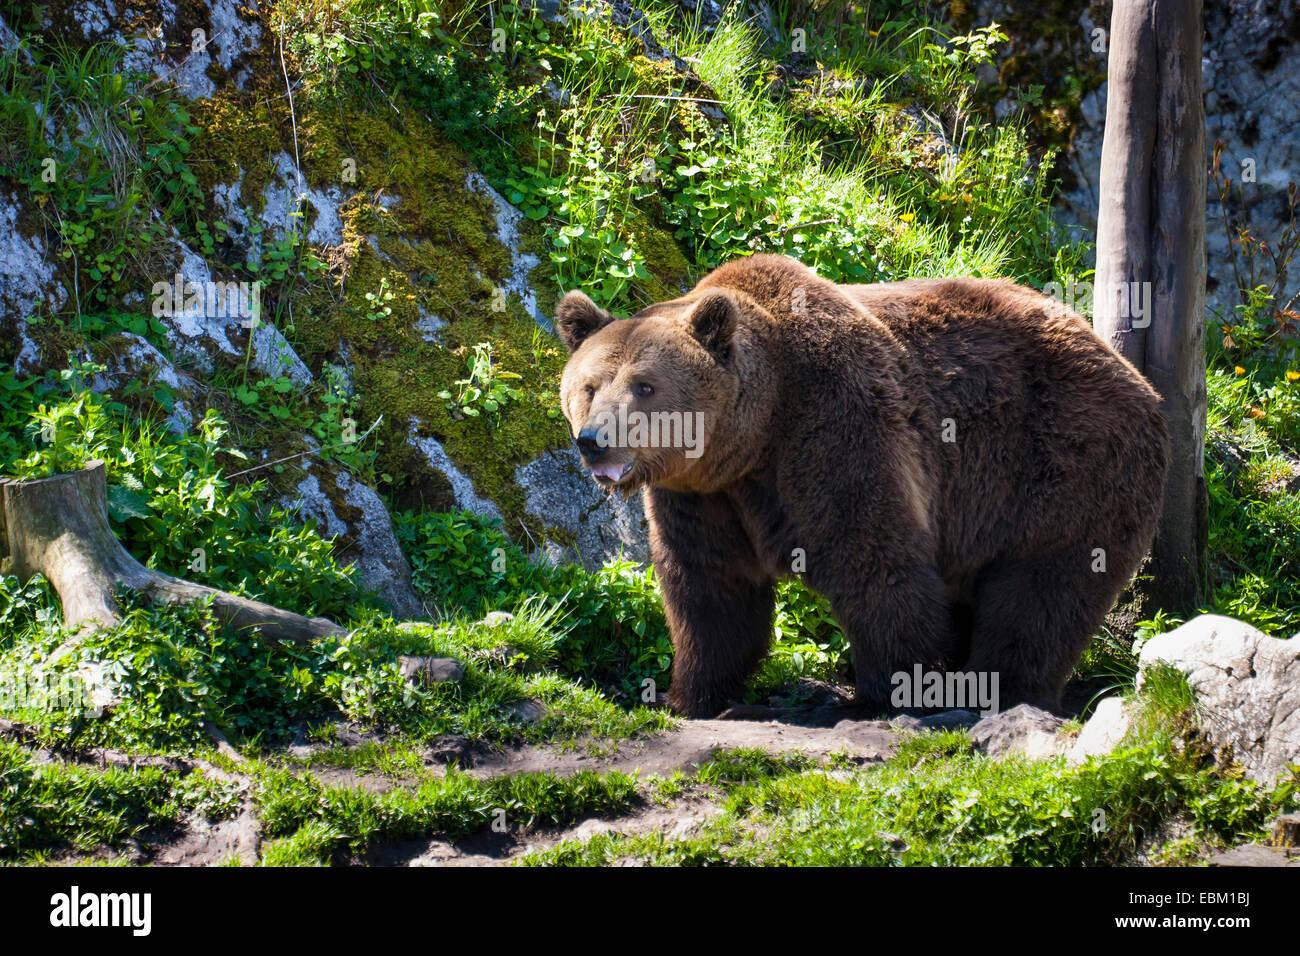 brown bear (Ursus arctos), Switzerland - Stock Image